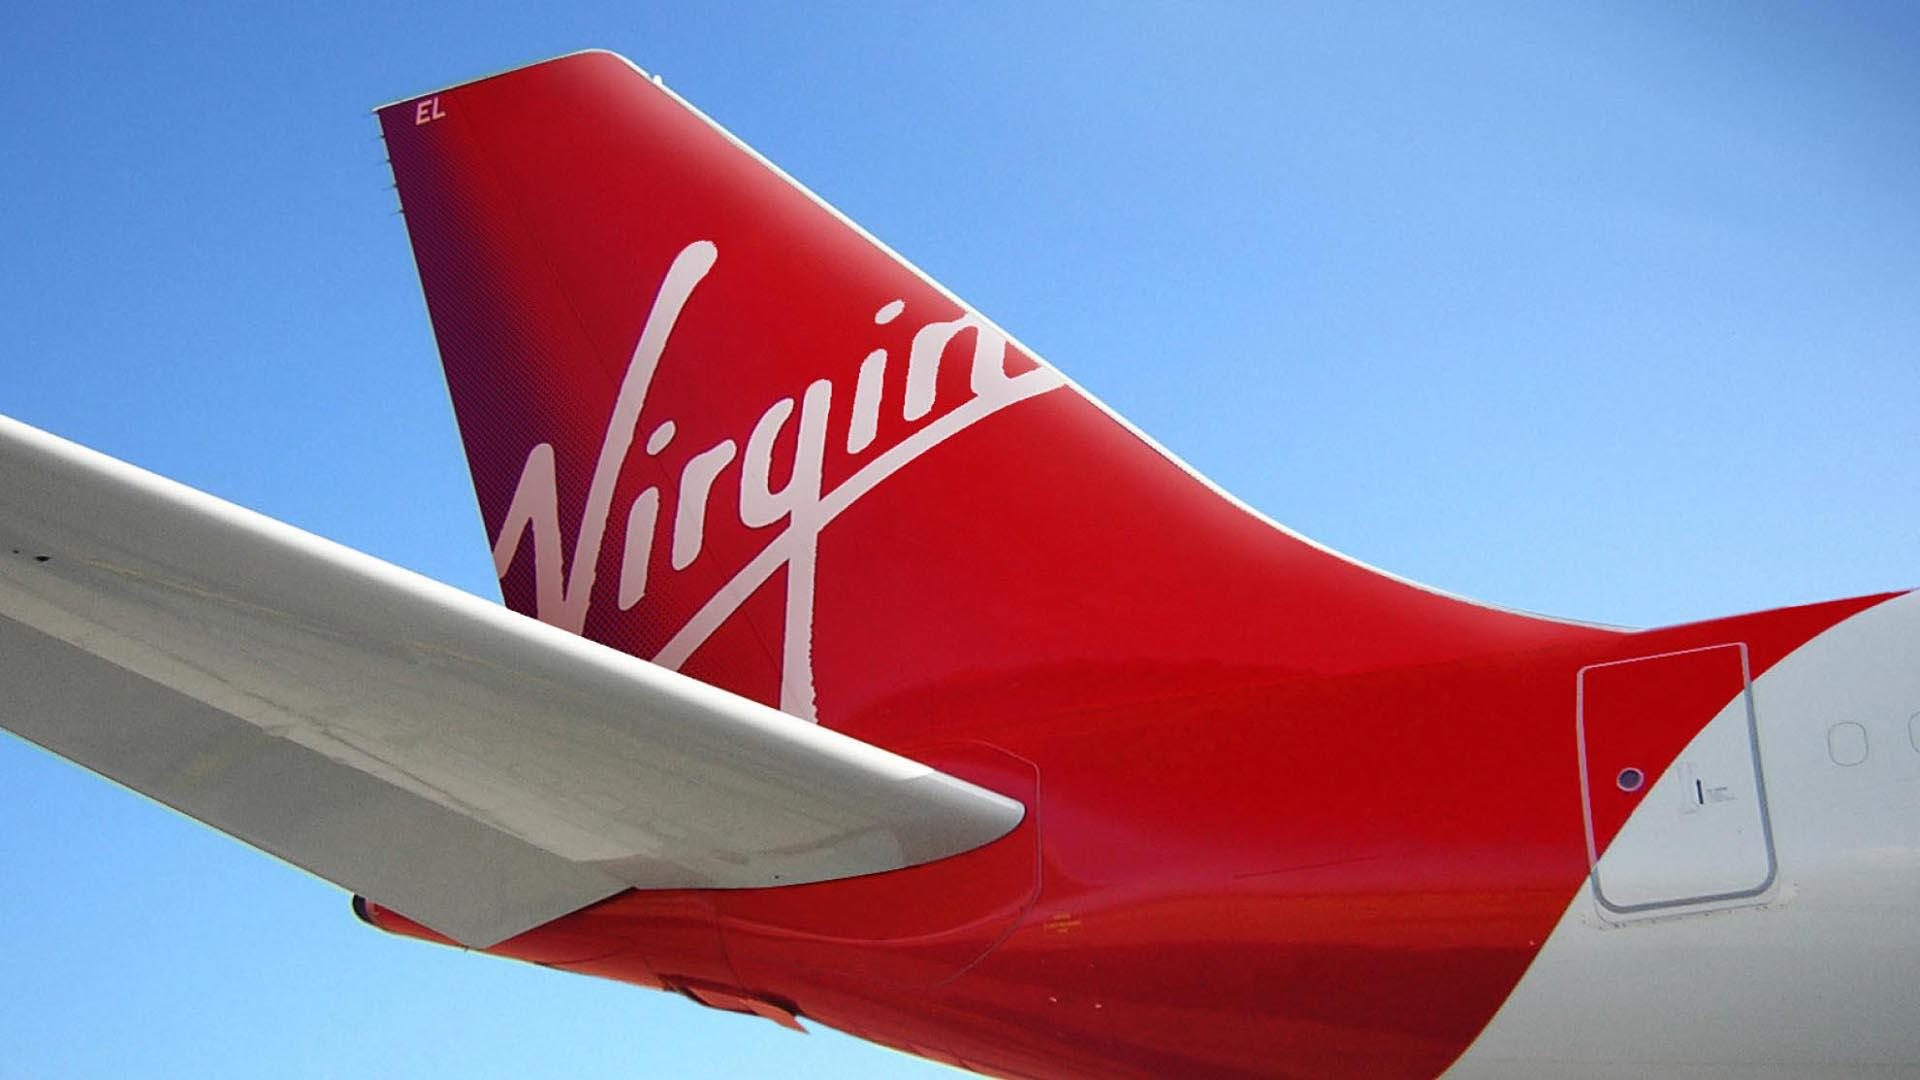 Rear End Of The Virgin Aircraft Wallpaper PaperPull 1920x1080